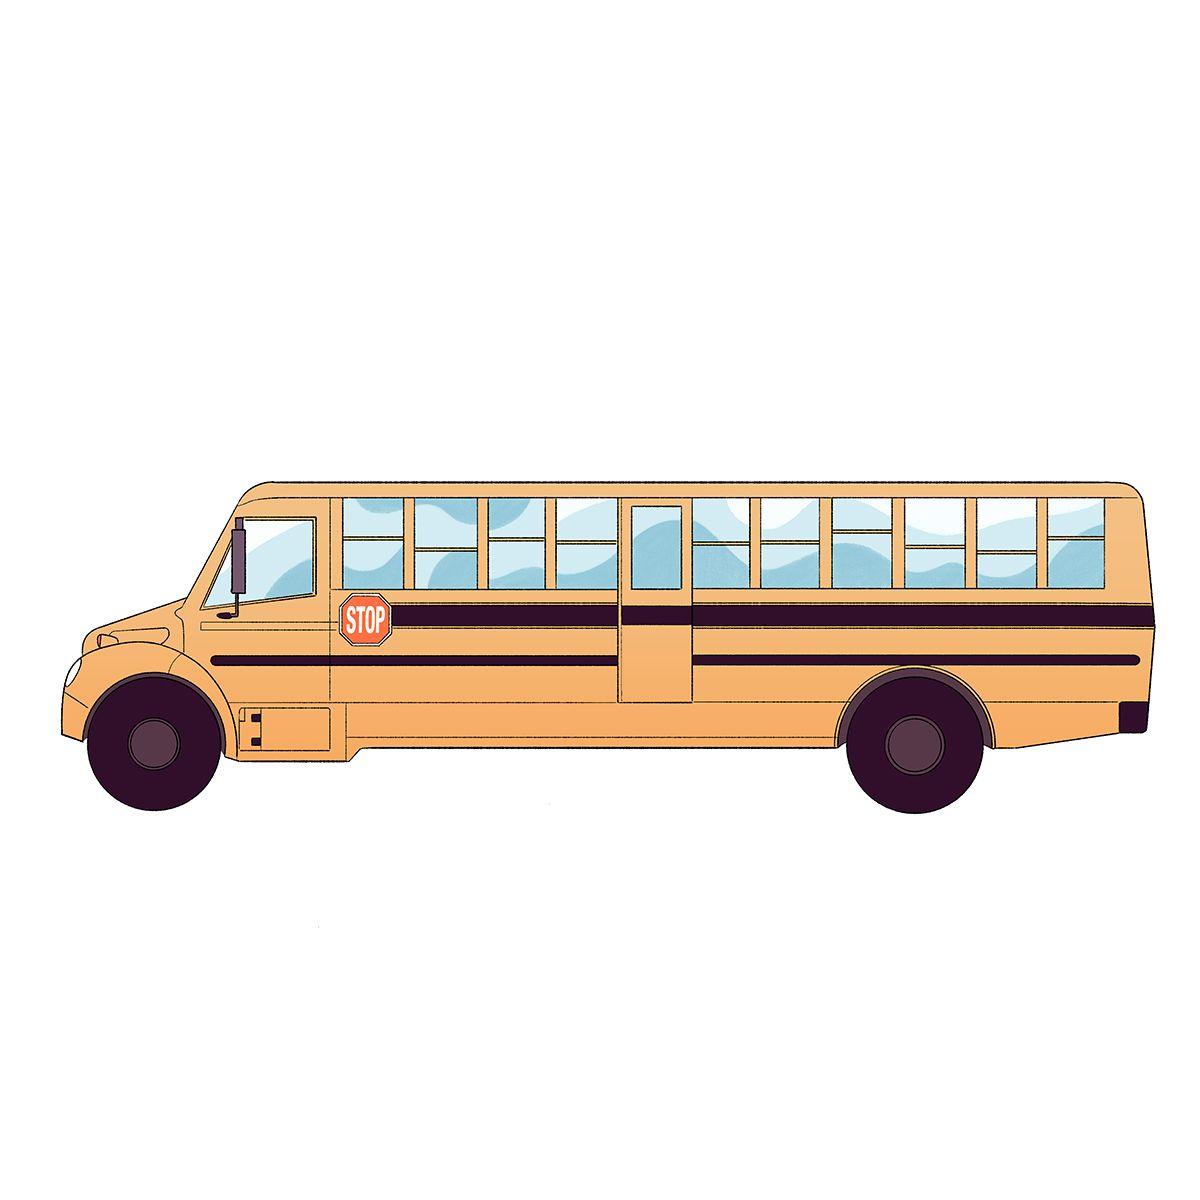 Illustration of a yellow school bus.